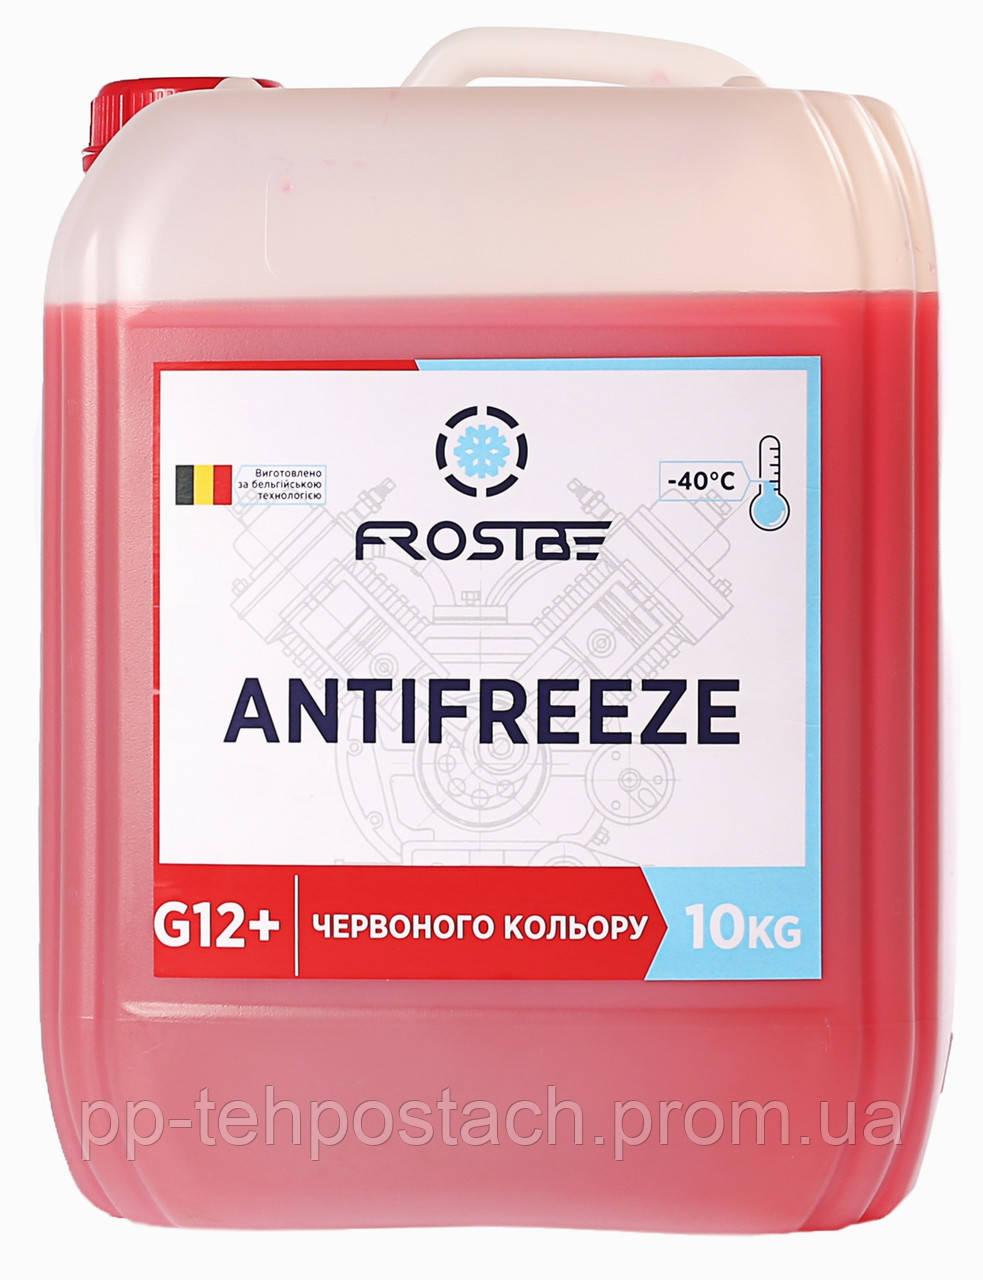 Антифриз Frostbe G12+10кг